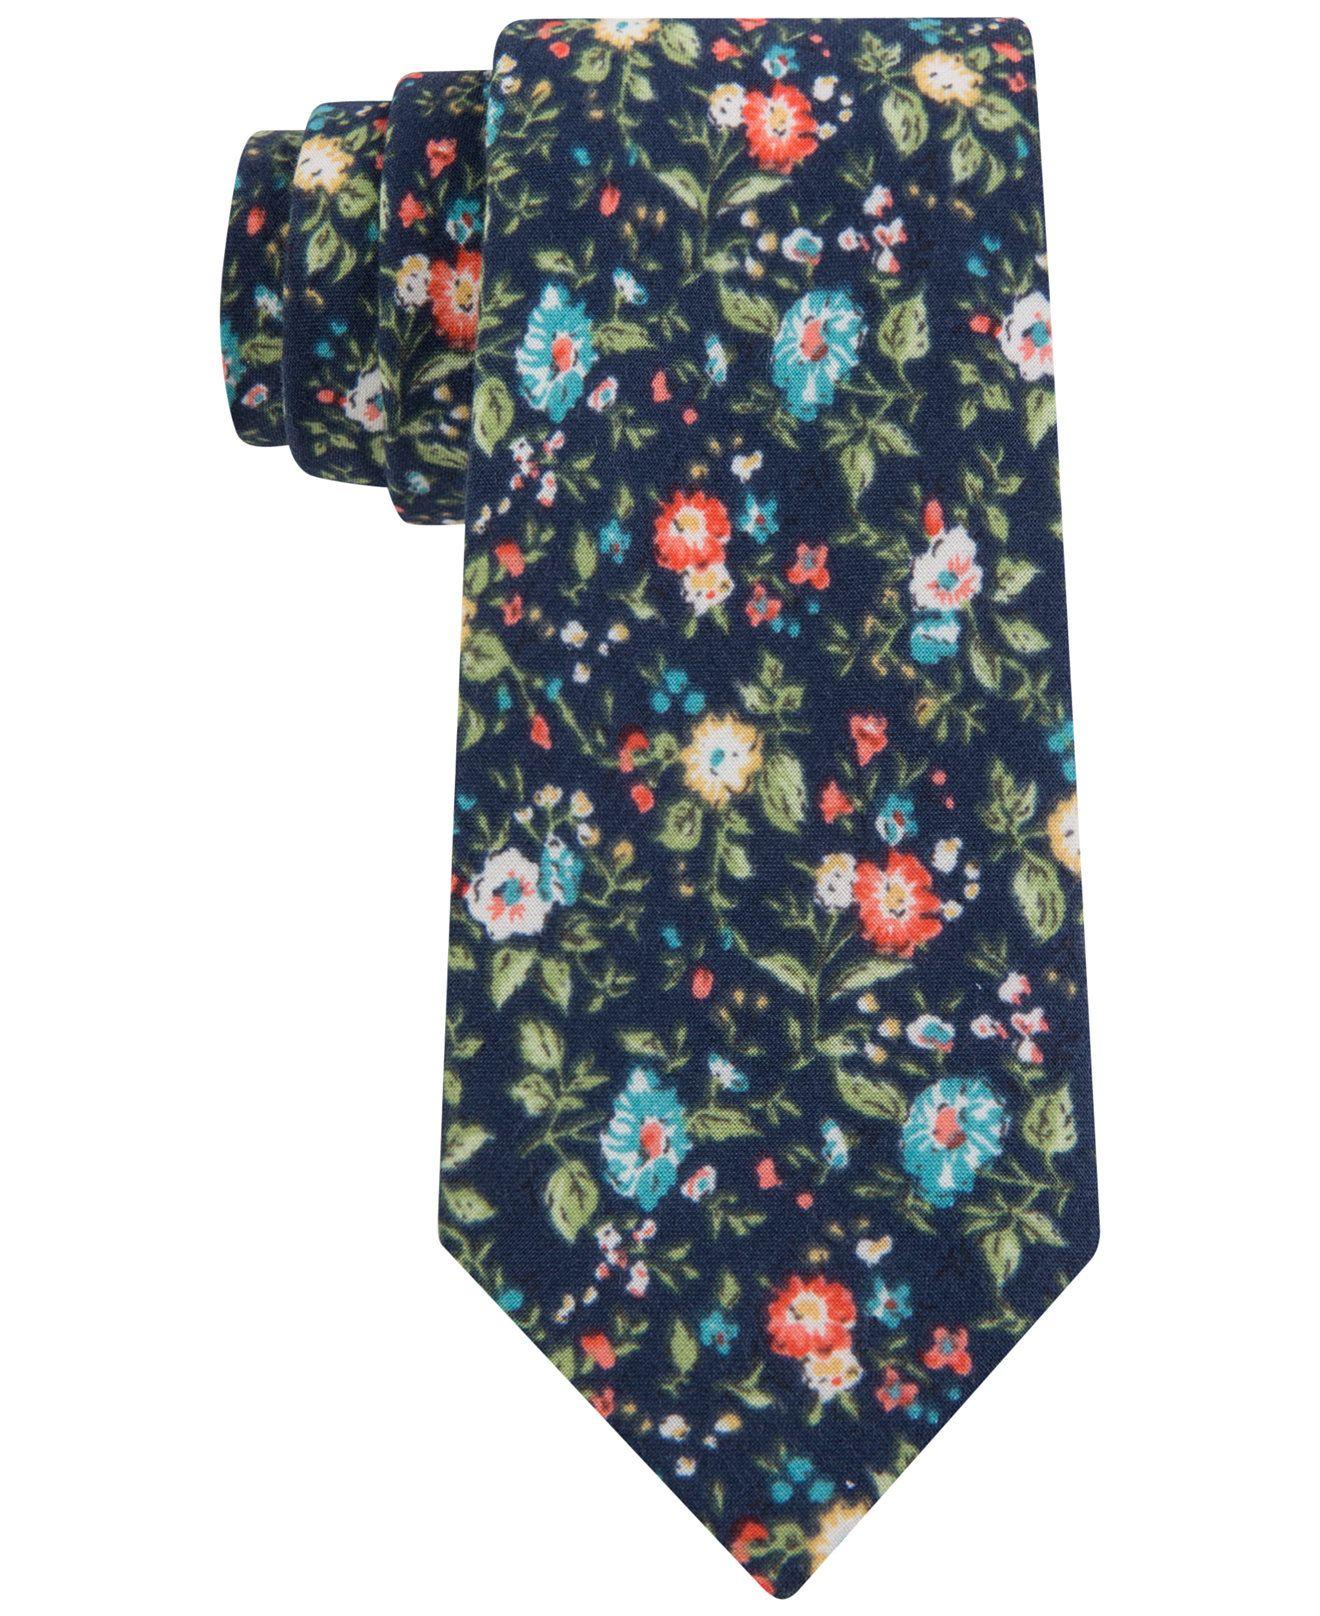 d54acdbd2bb9 Tommy Hilfiger Men's Multi-Floral-Print Skinny Tie - Ties & Pocket Squares  - Men - Macy's